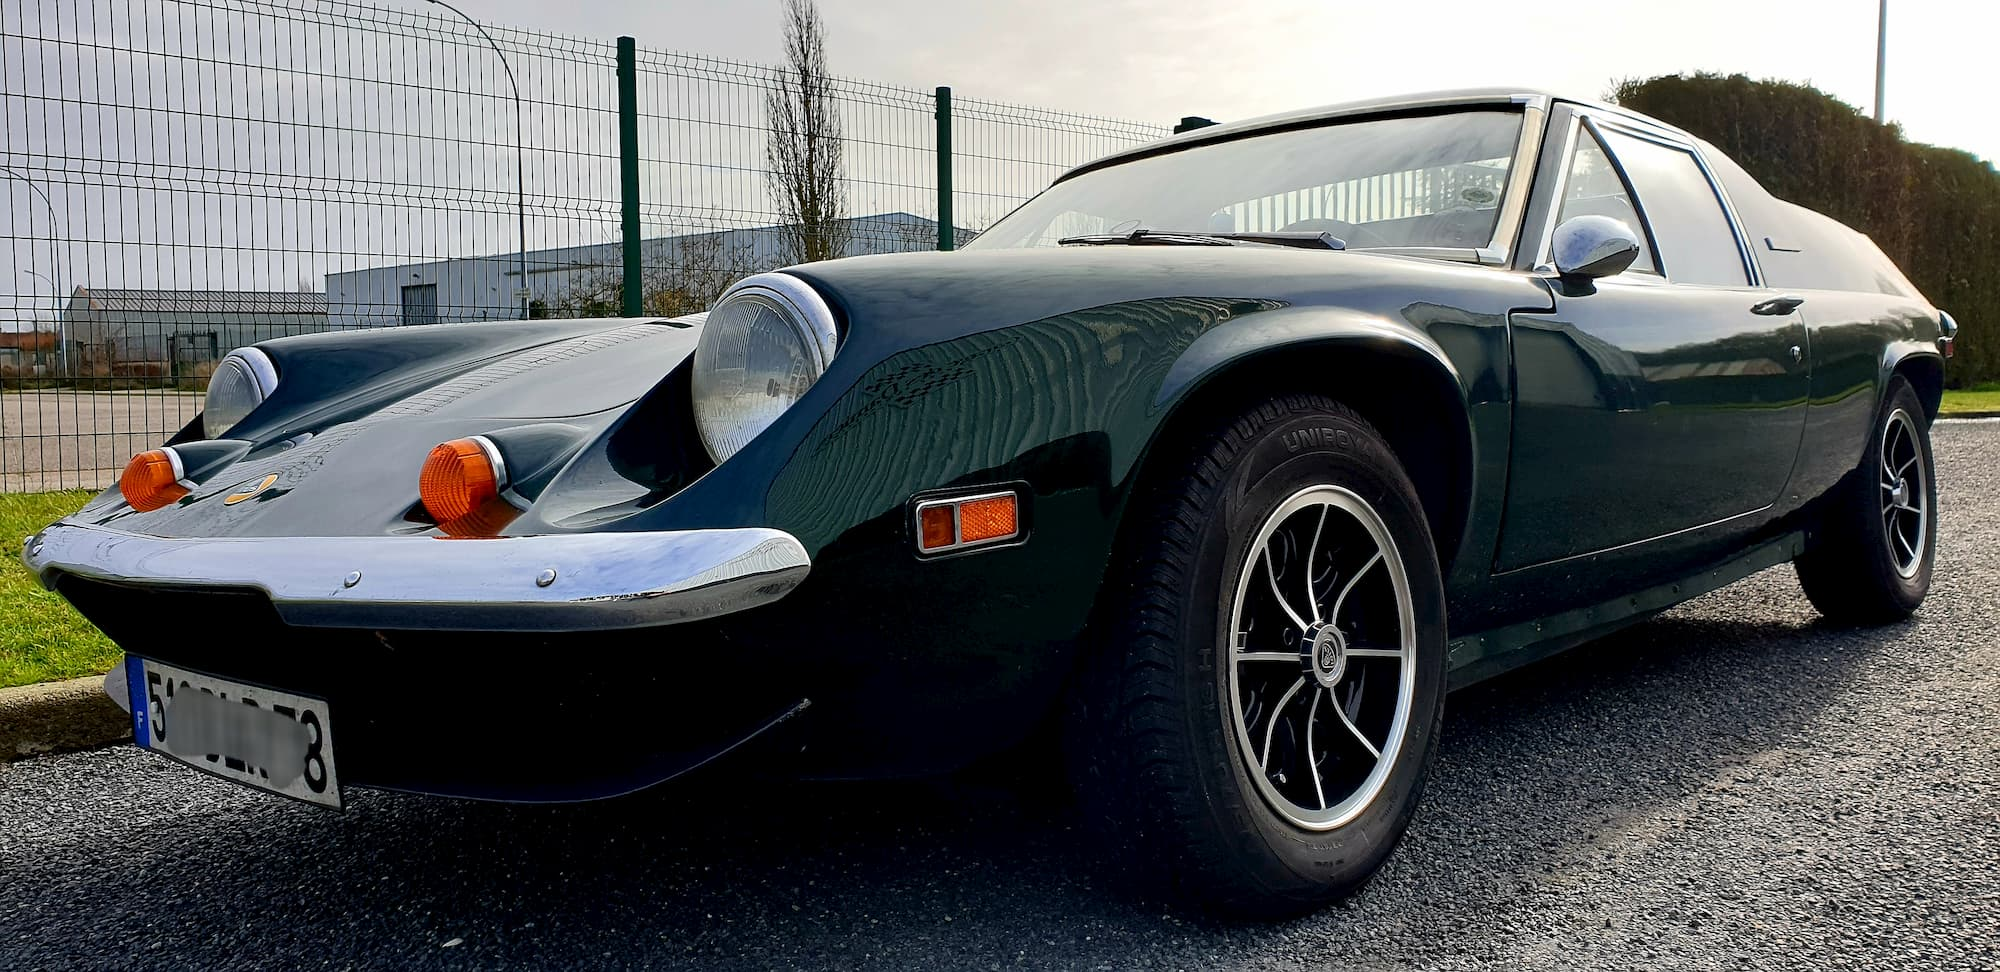 Lotus Europa au Garage des Damiers - Old british car et vintage cars